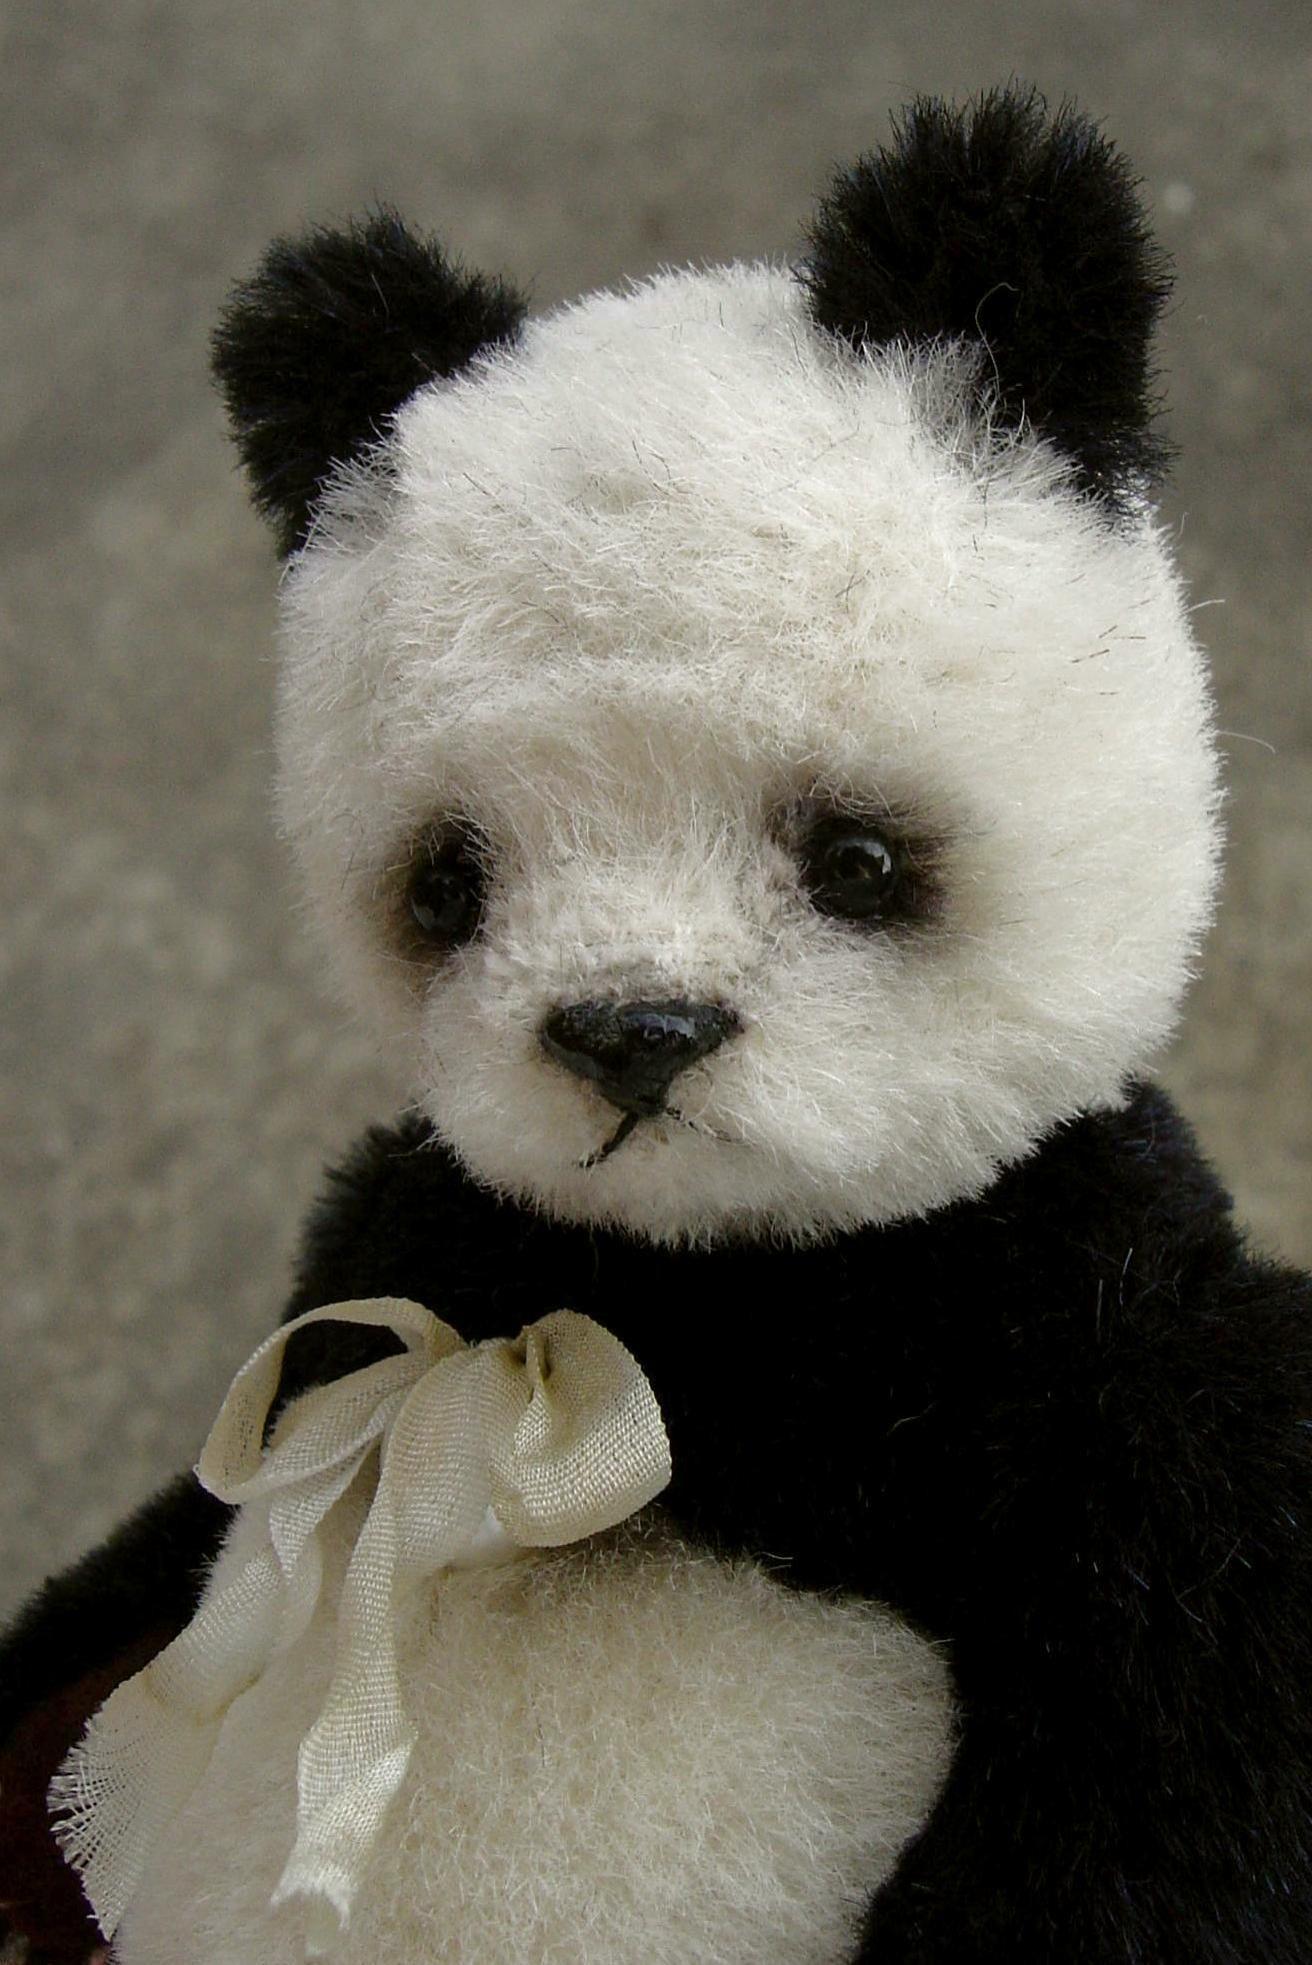 Love stuffed Panda Bears Had one as a little girl